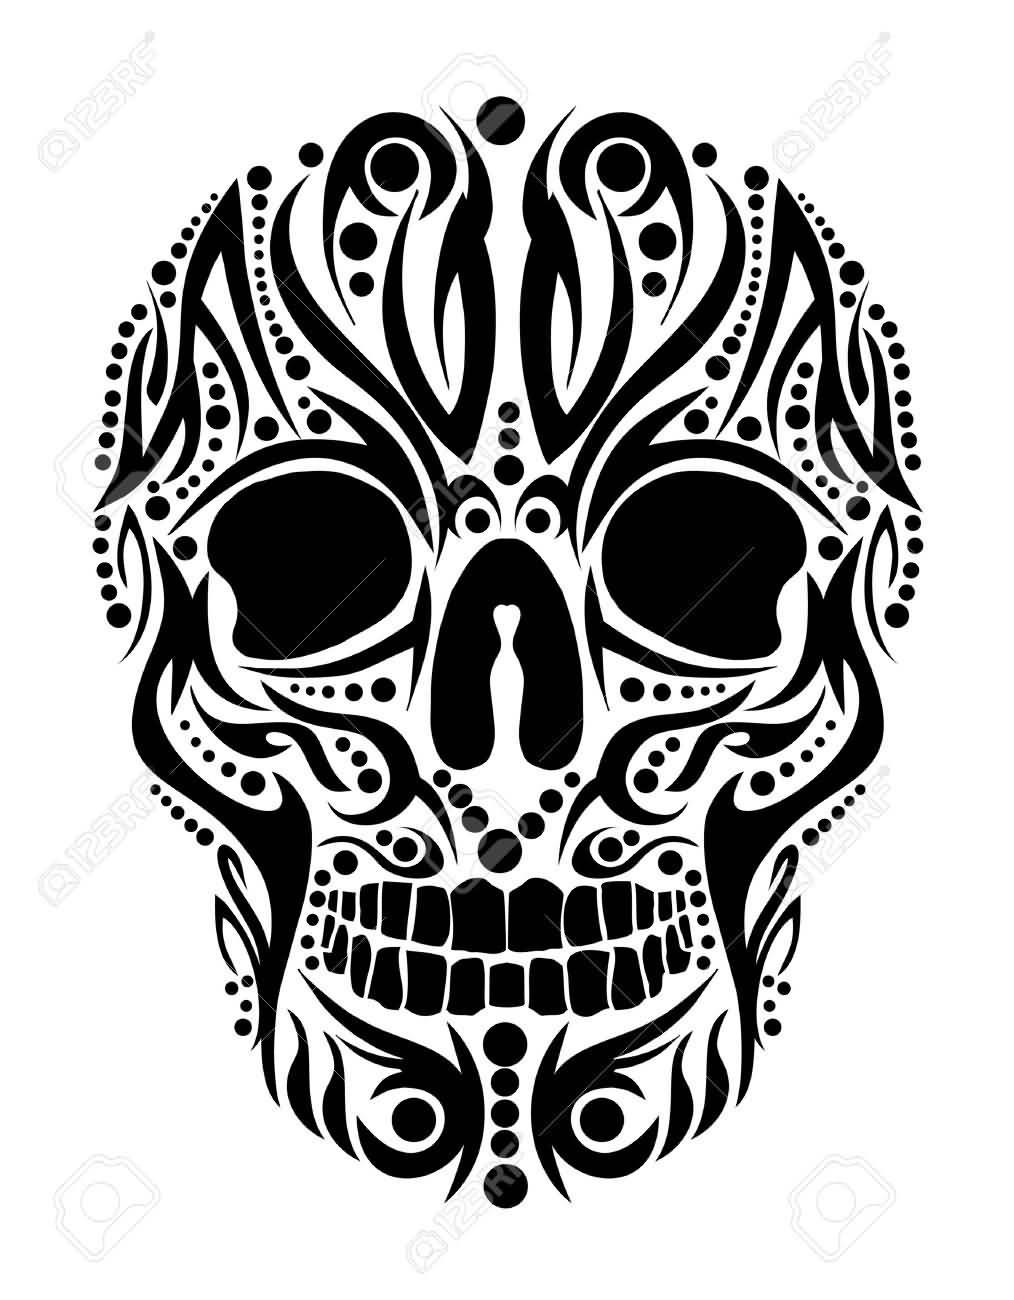 1014x1300 Tribal Skull Drawings Black Tribal Skull Tattoo Design